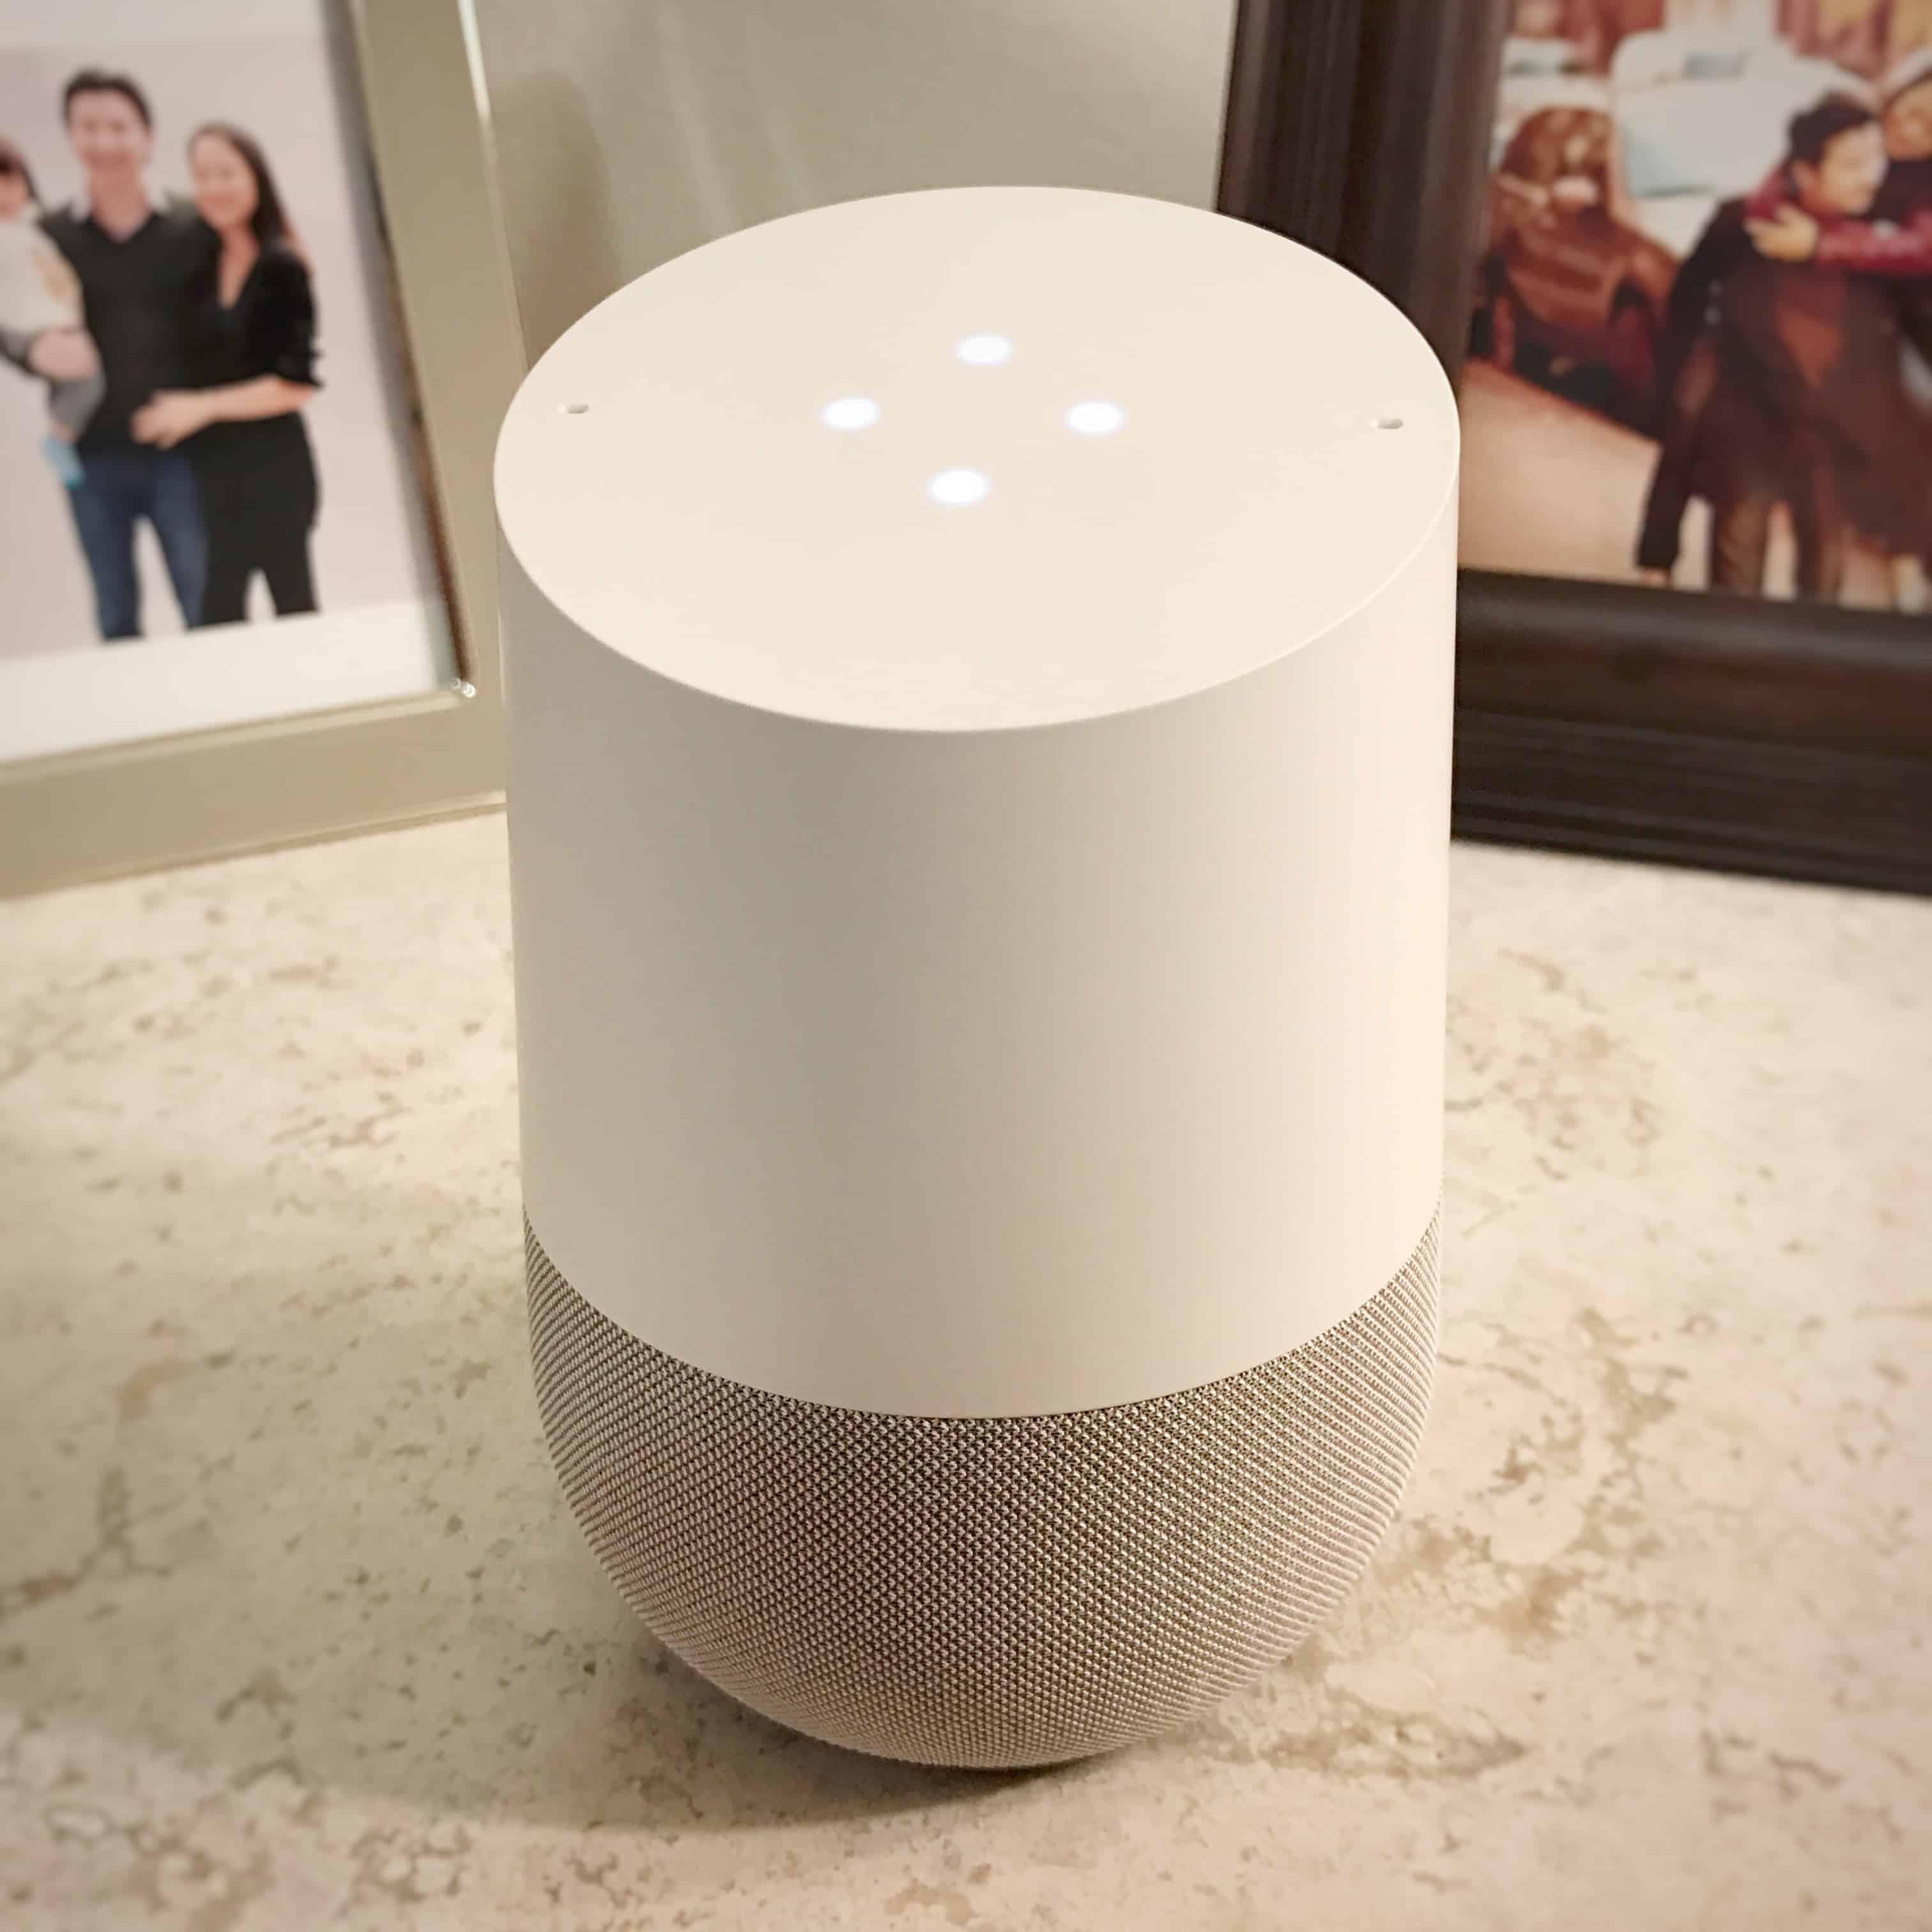 Google Home Review - Full Shot